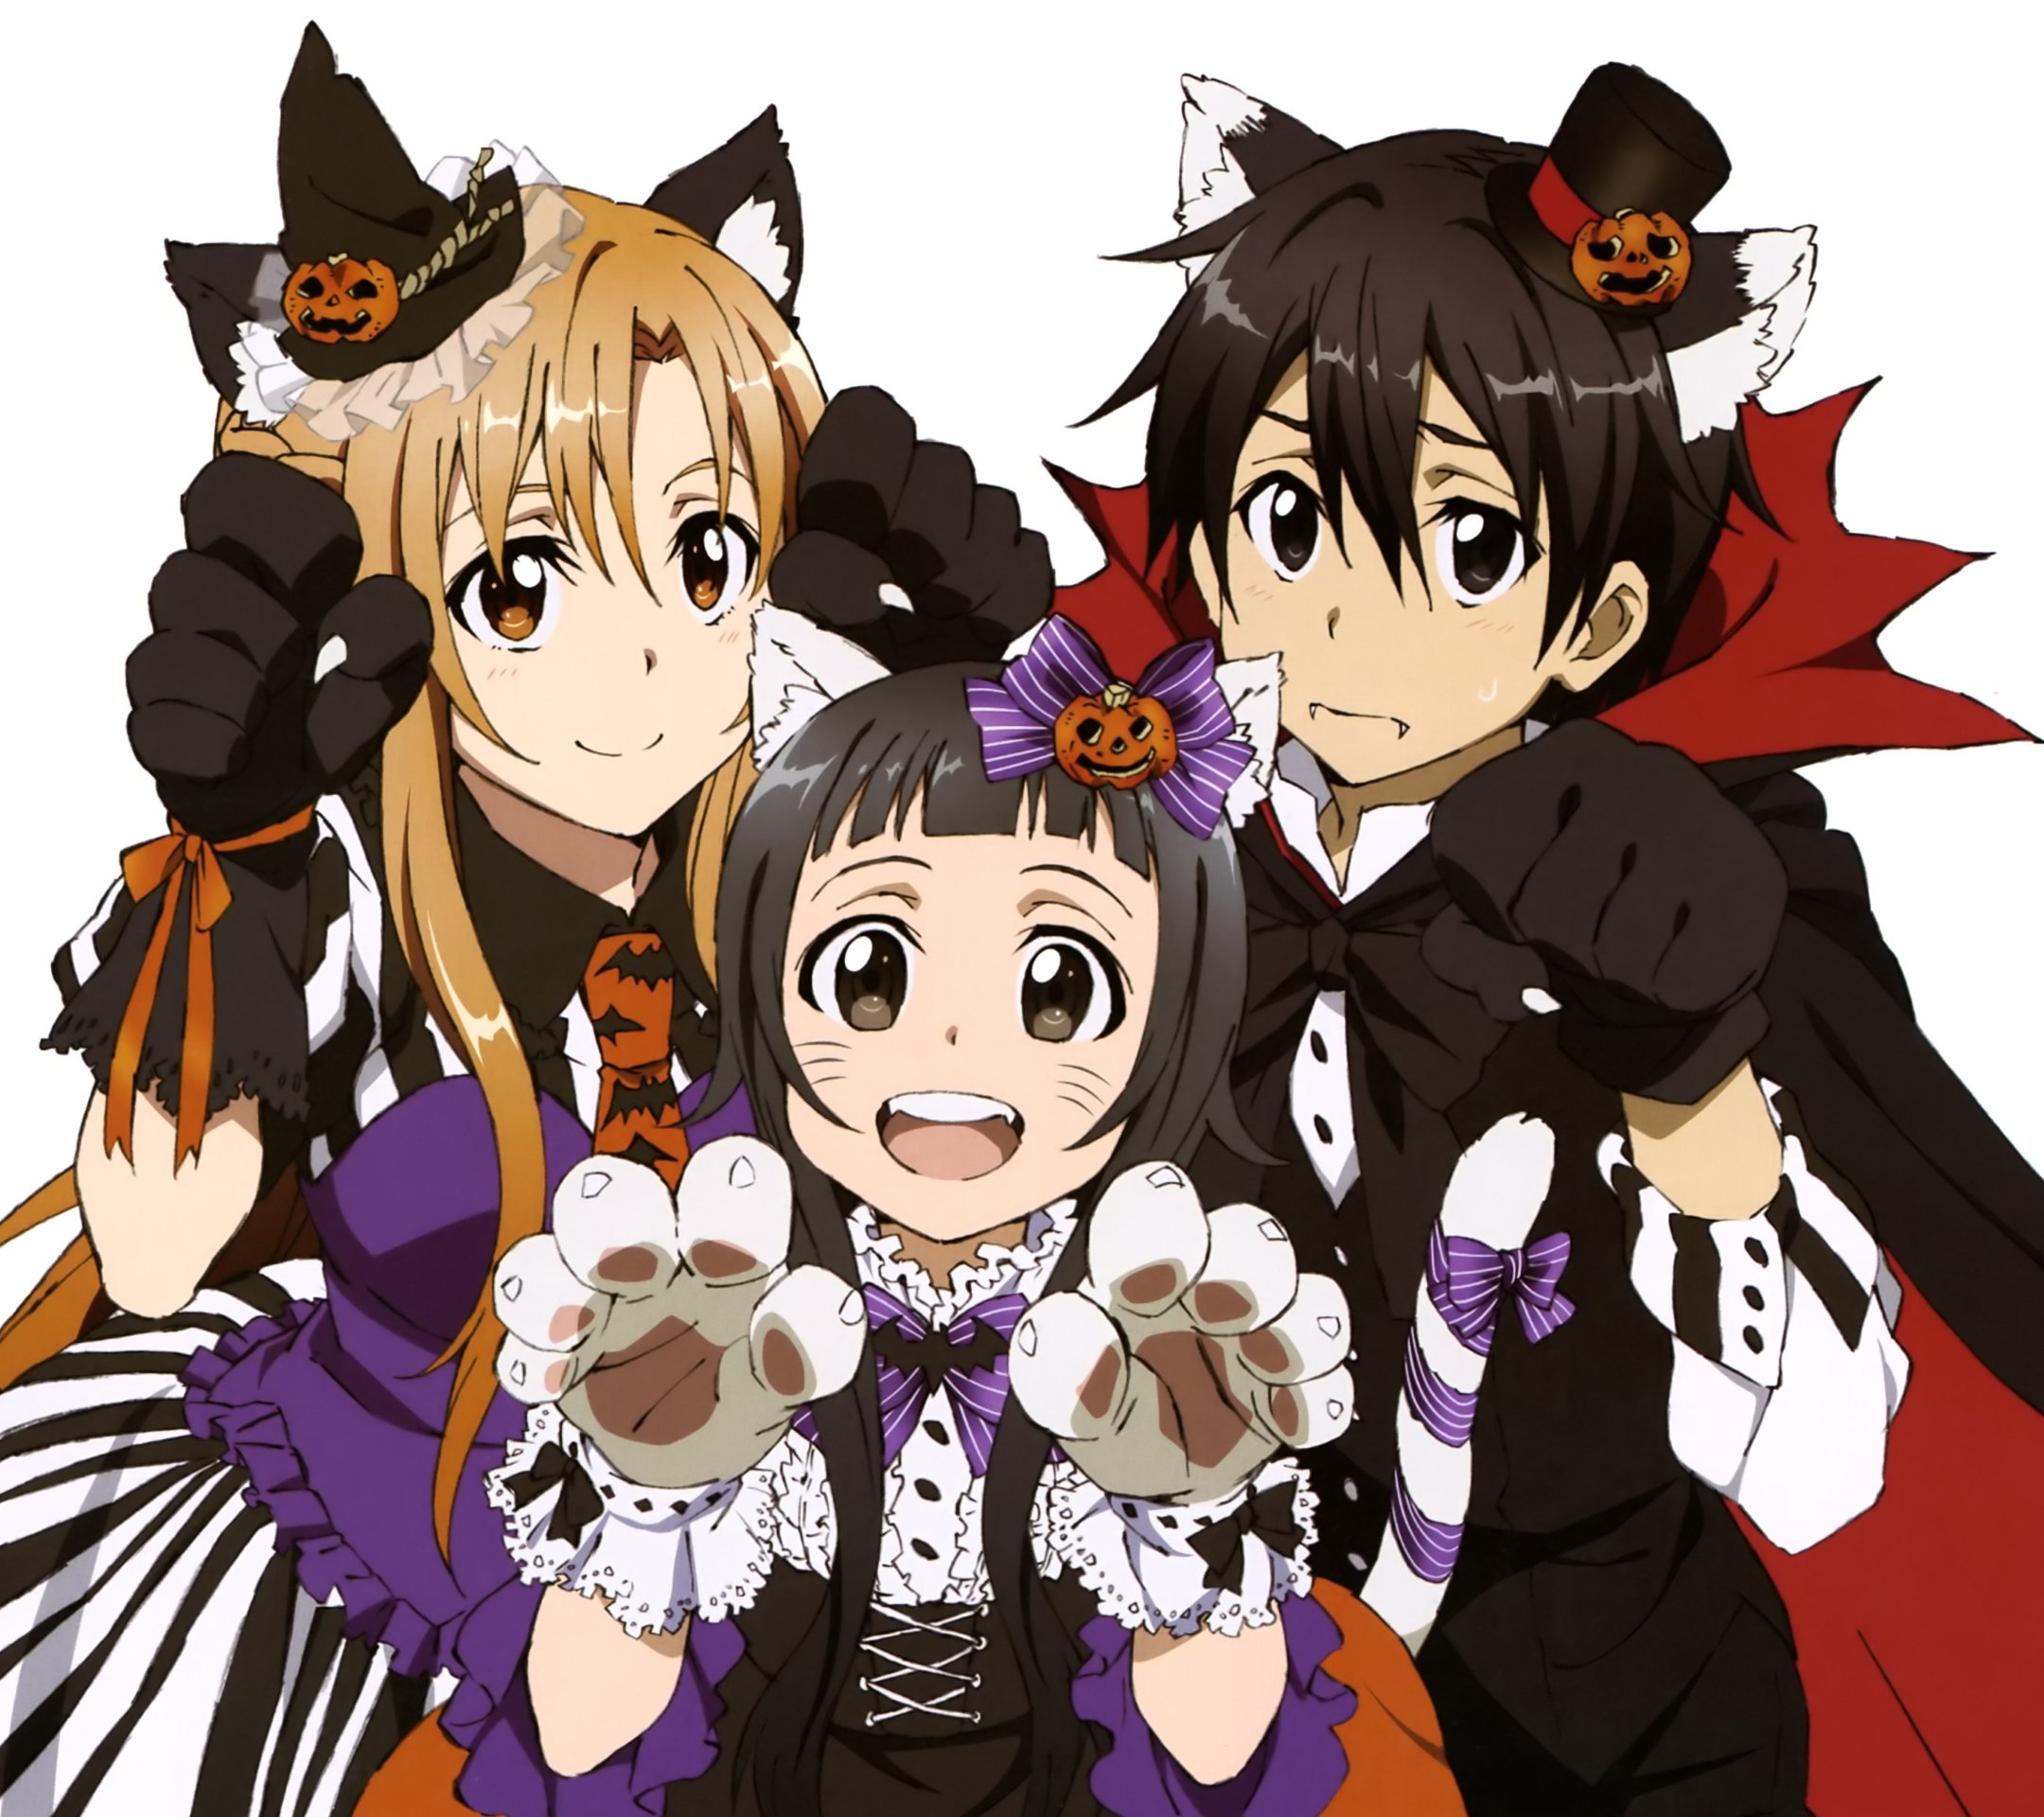 Halloween Kirito Asuna.Android wallpaper 2160x1920